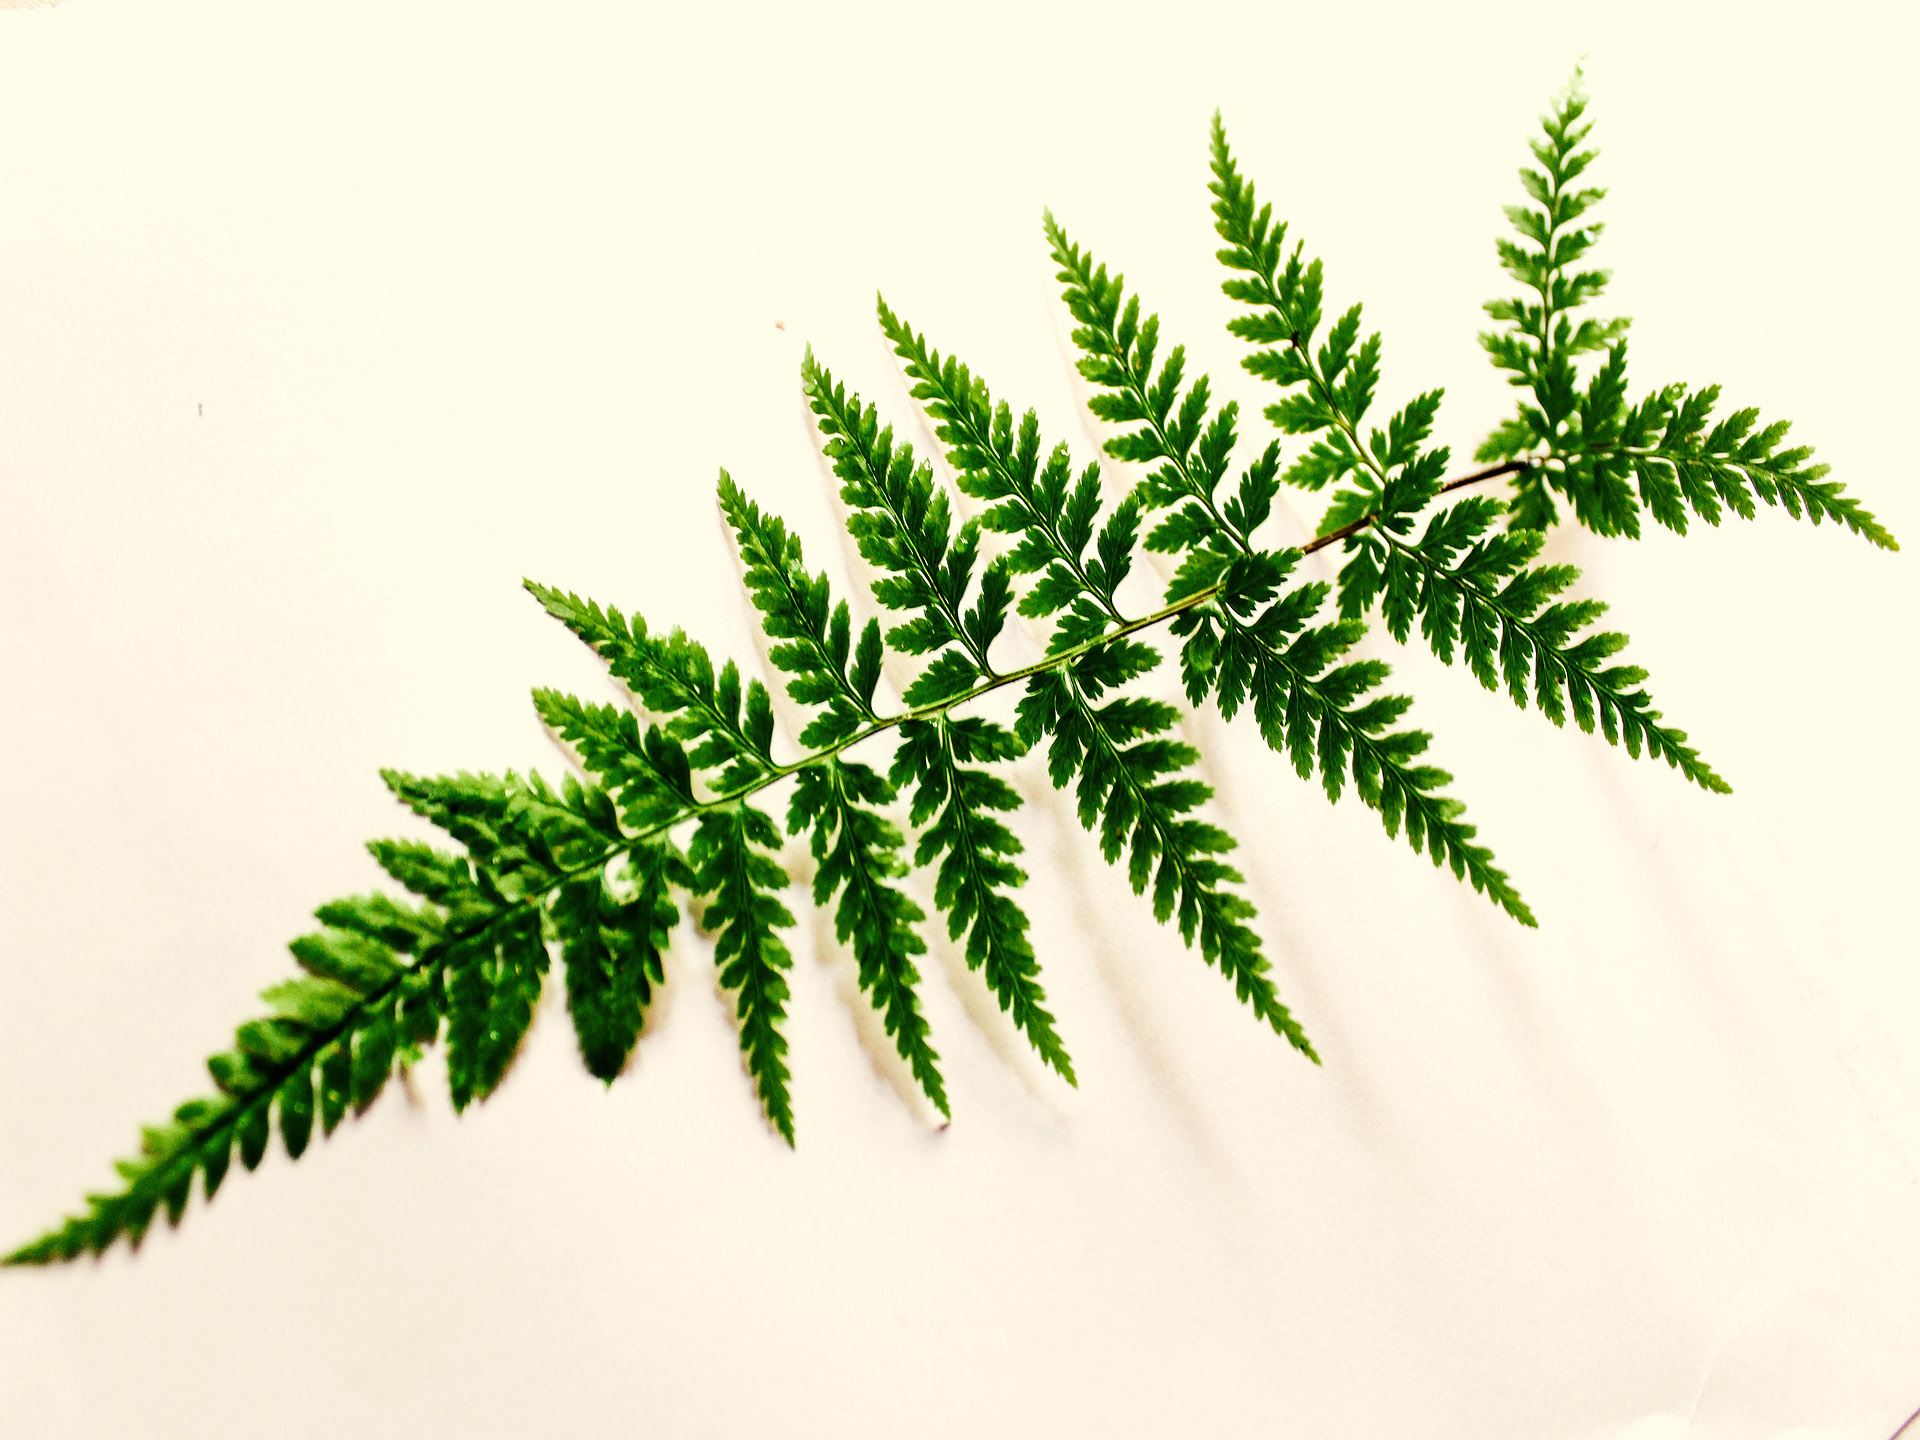 green-leaf-photography-691043